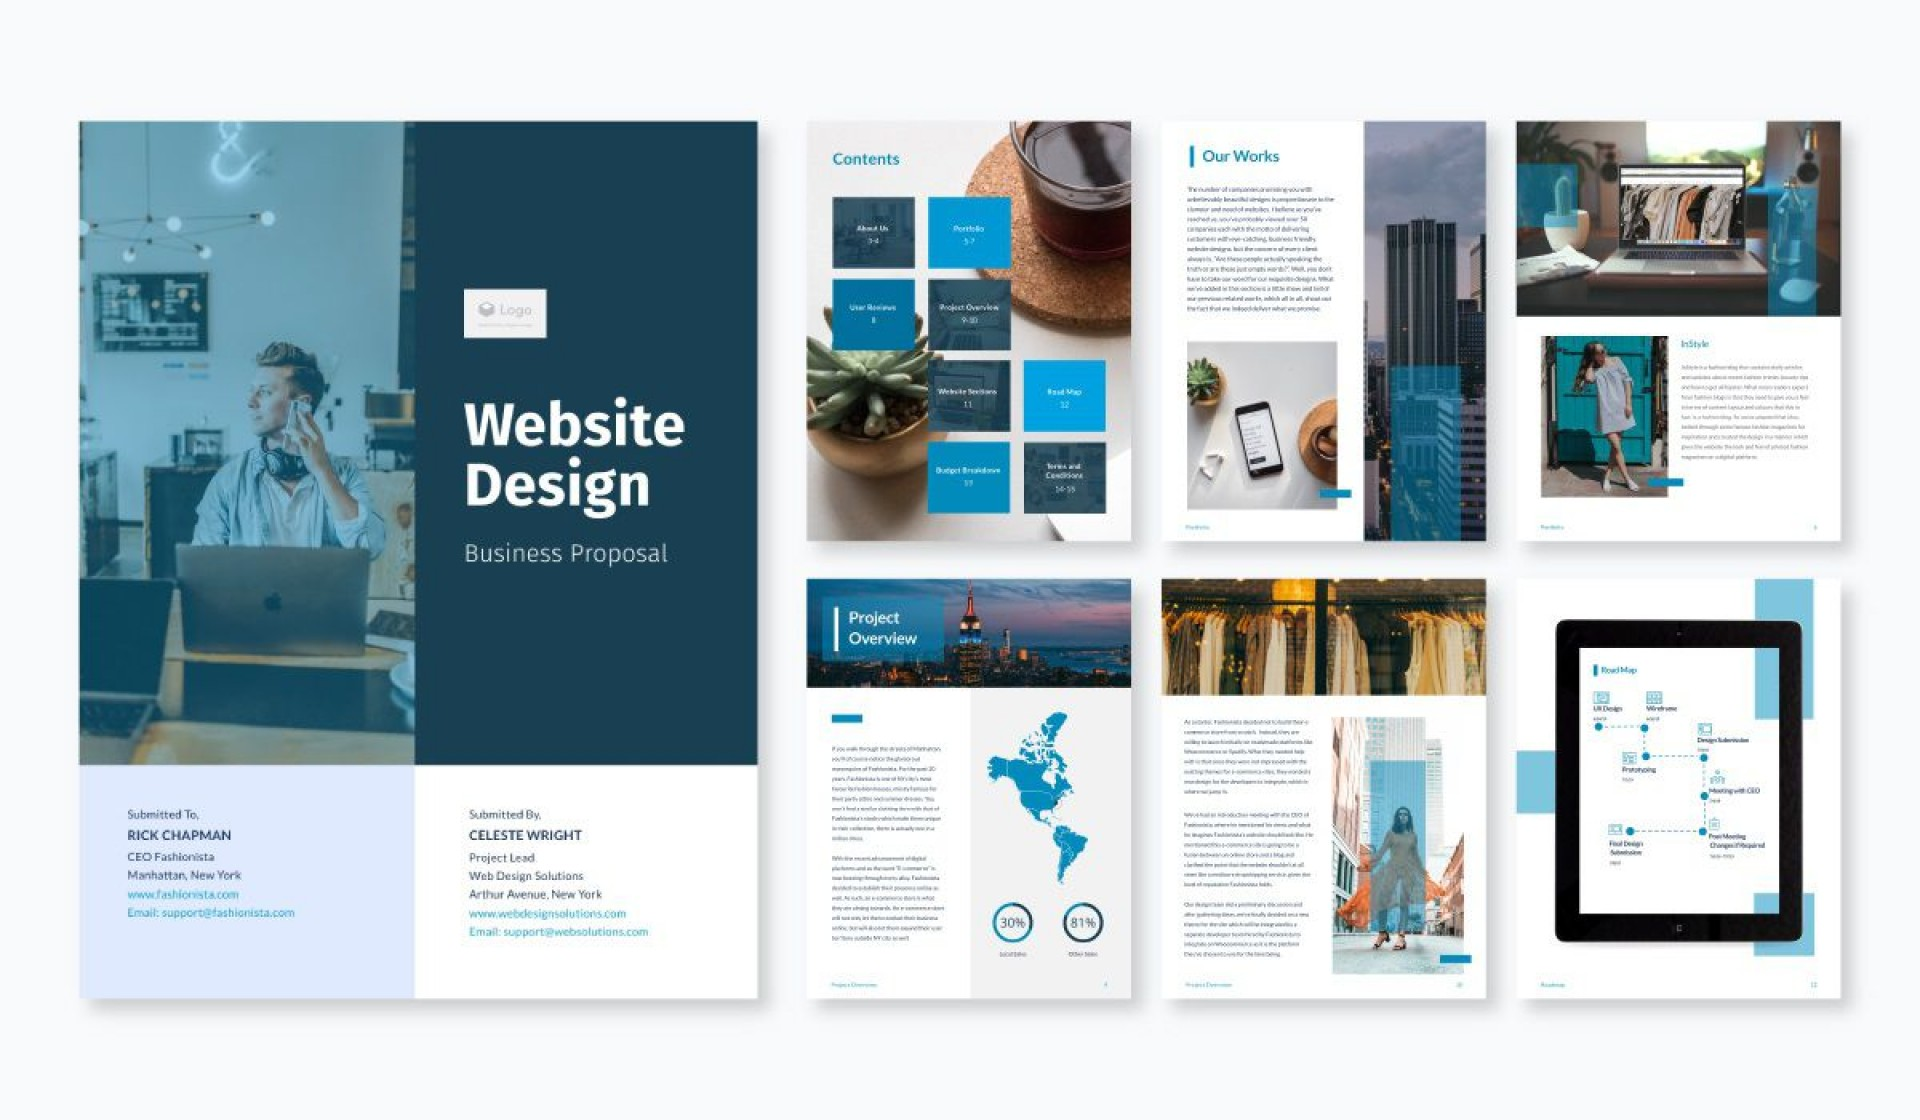 002 Best Web Design Proposal Template Free Image  Freelance Download1920